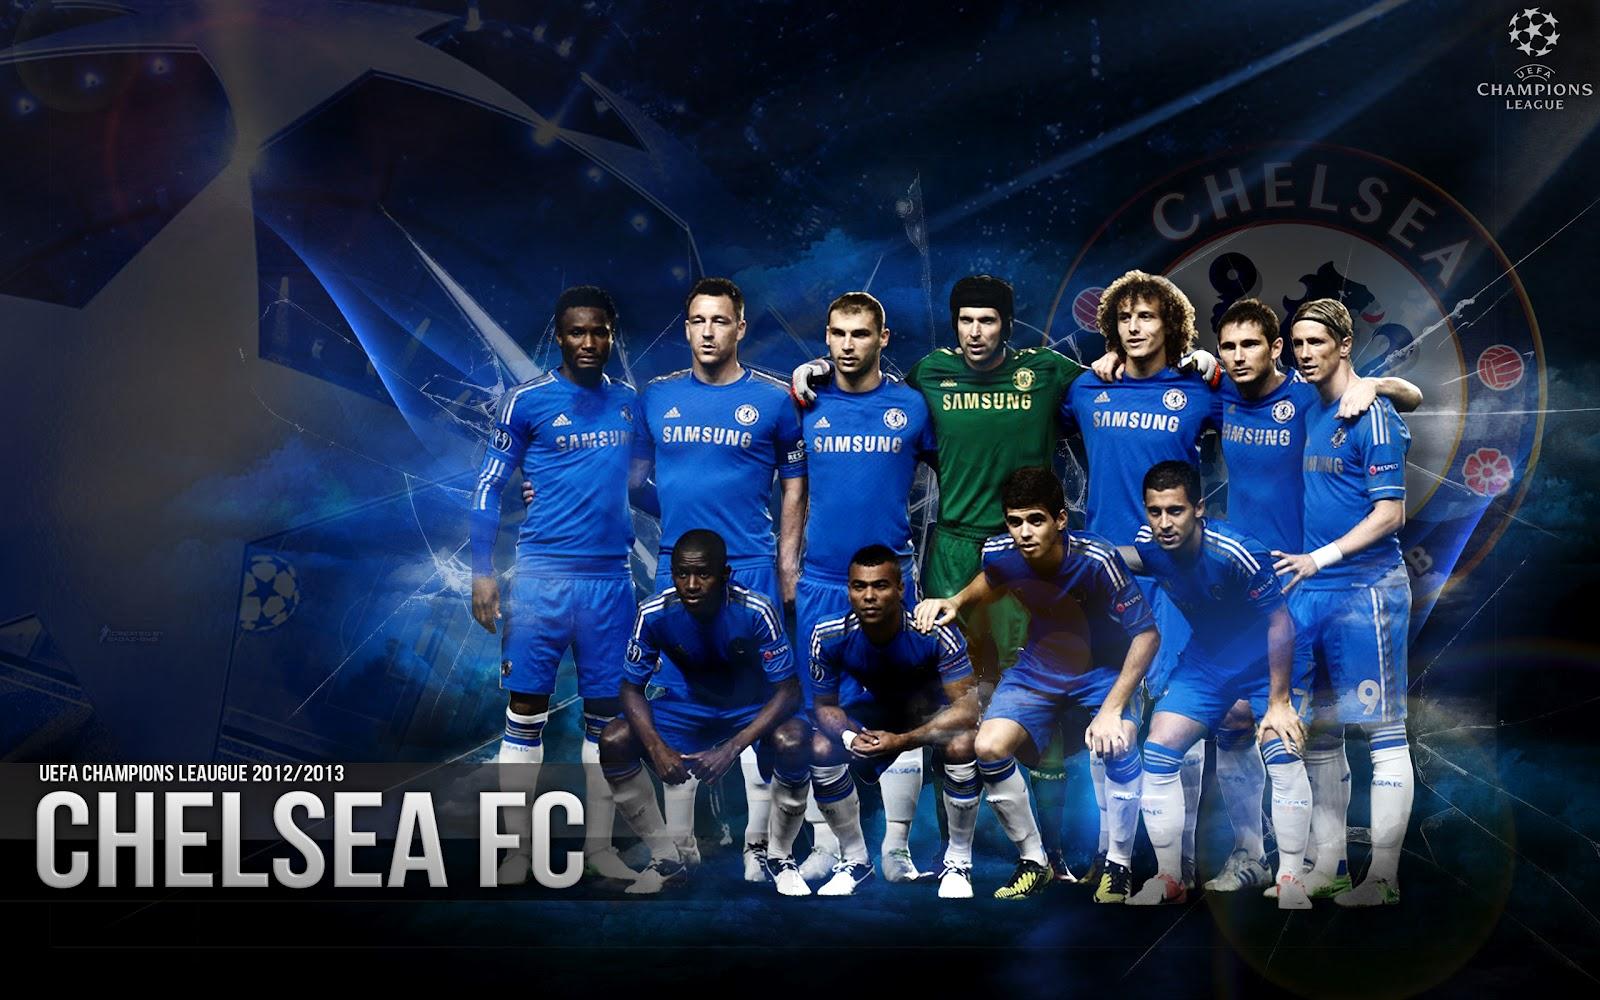 Football Club 6 Chelsea 1600x1000